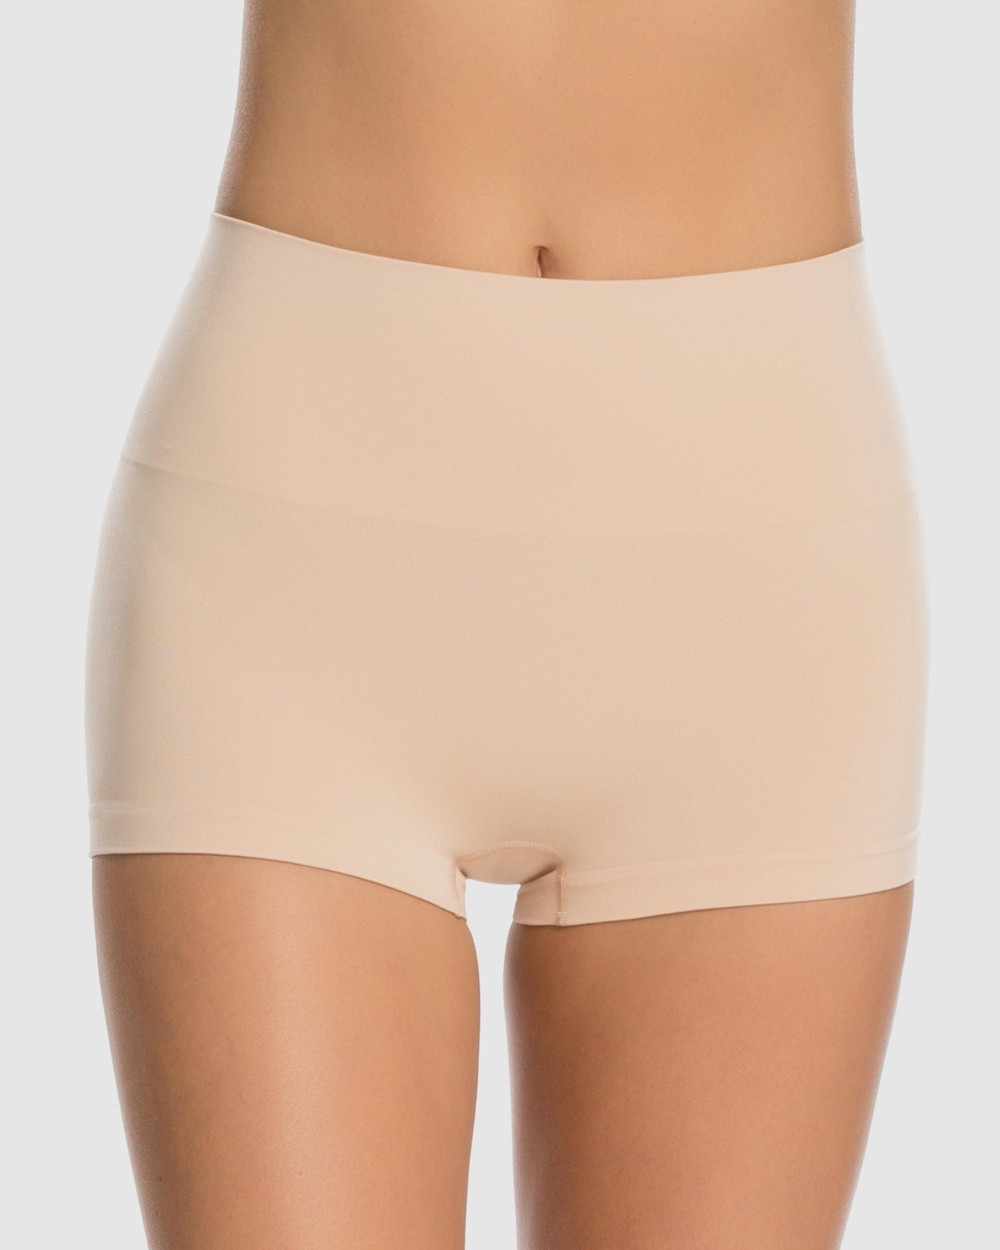 Spanx Everyday Shaping Panties Underwear & Sleepwear Soft Nude